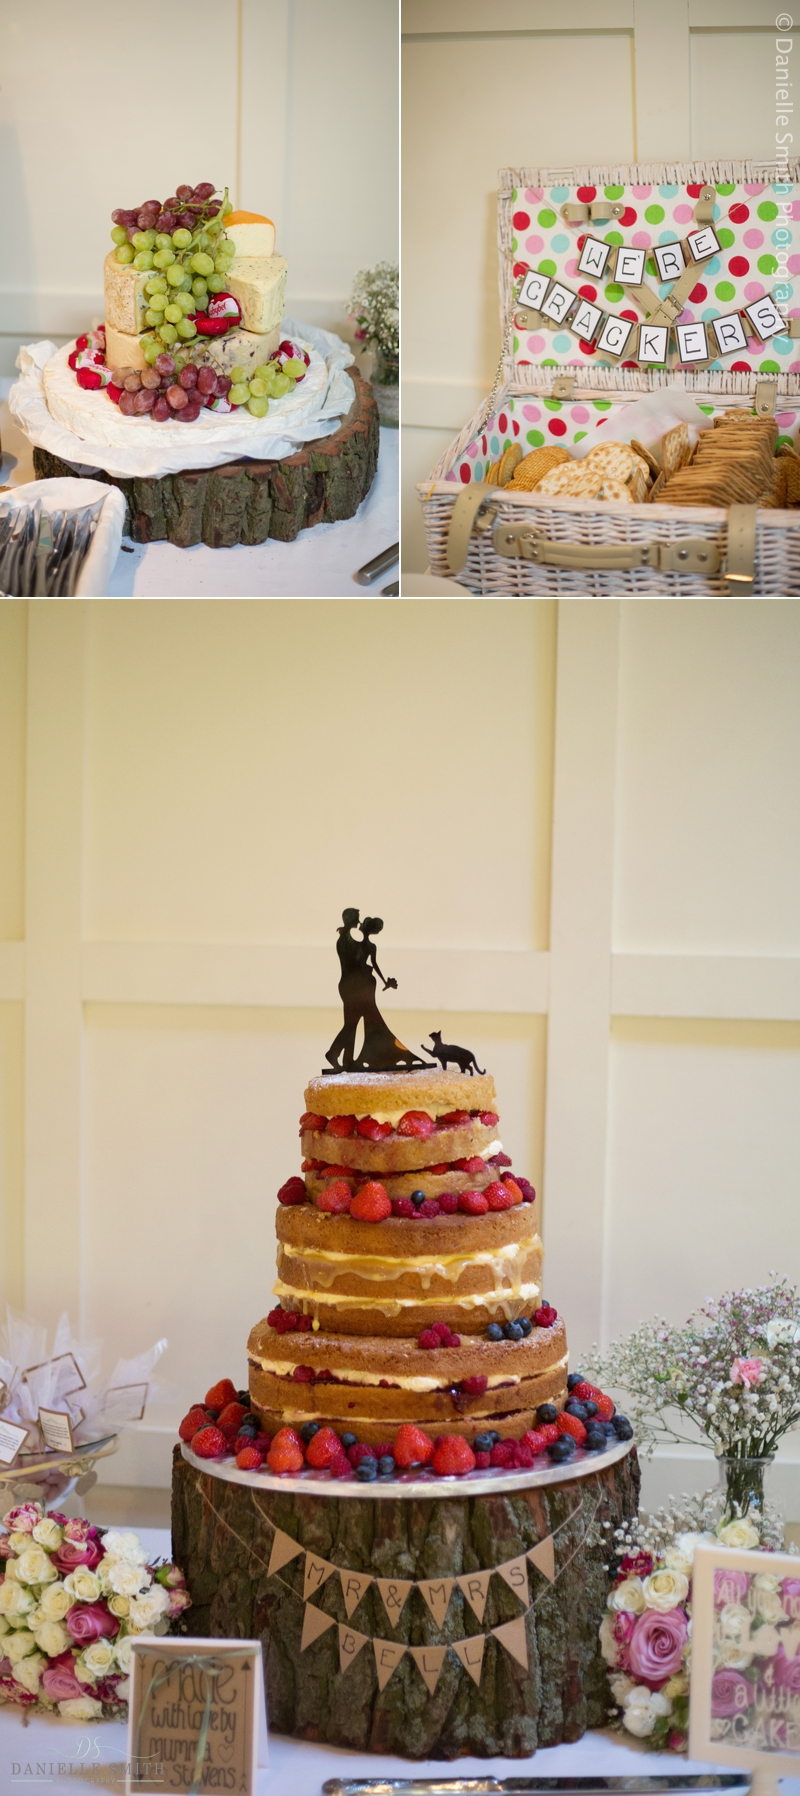 cheese cake and wedding cake